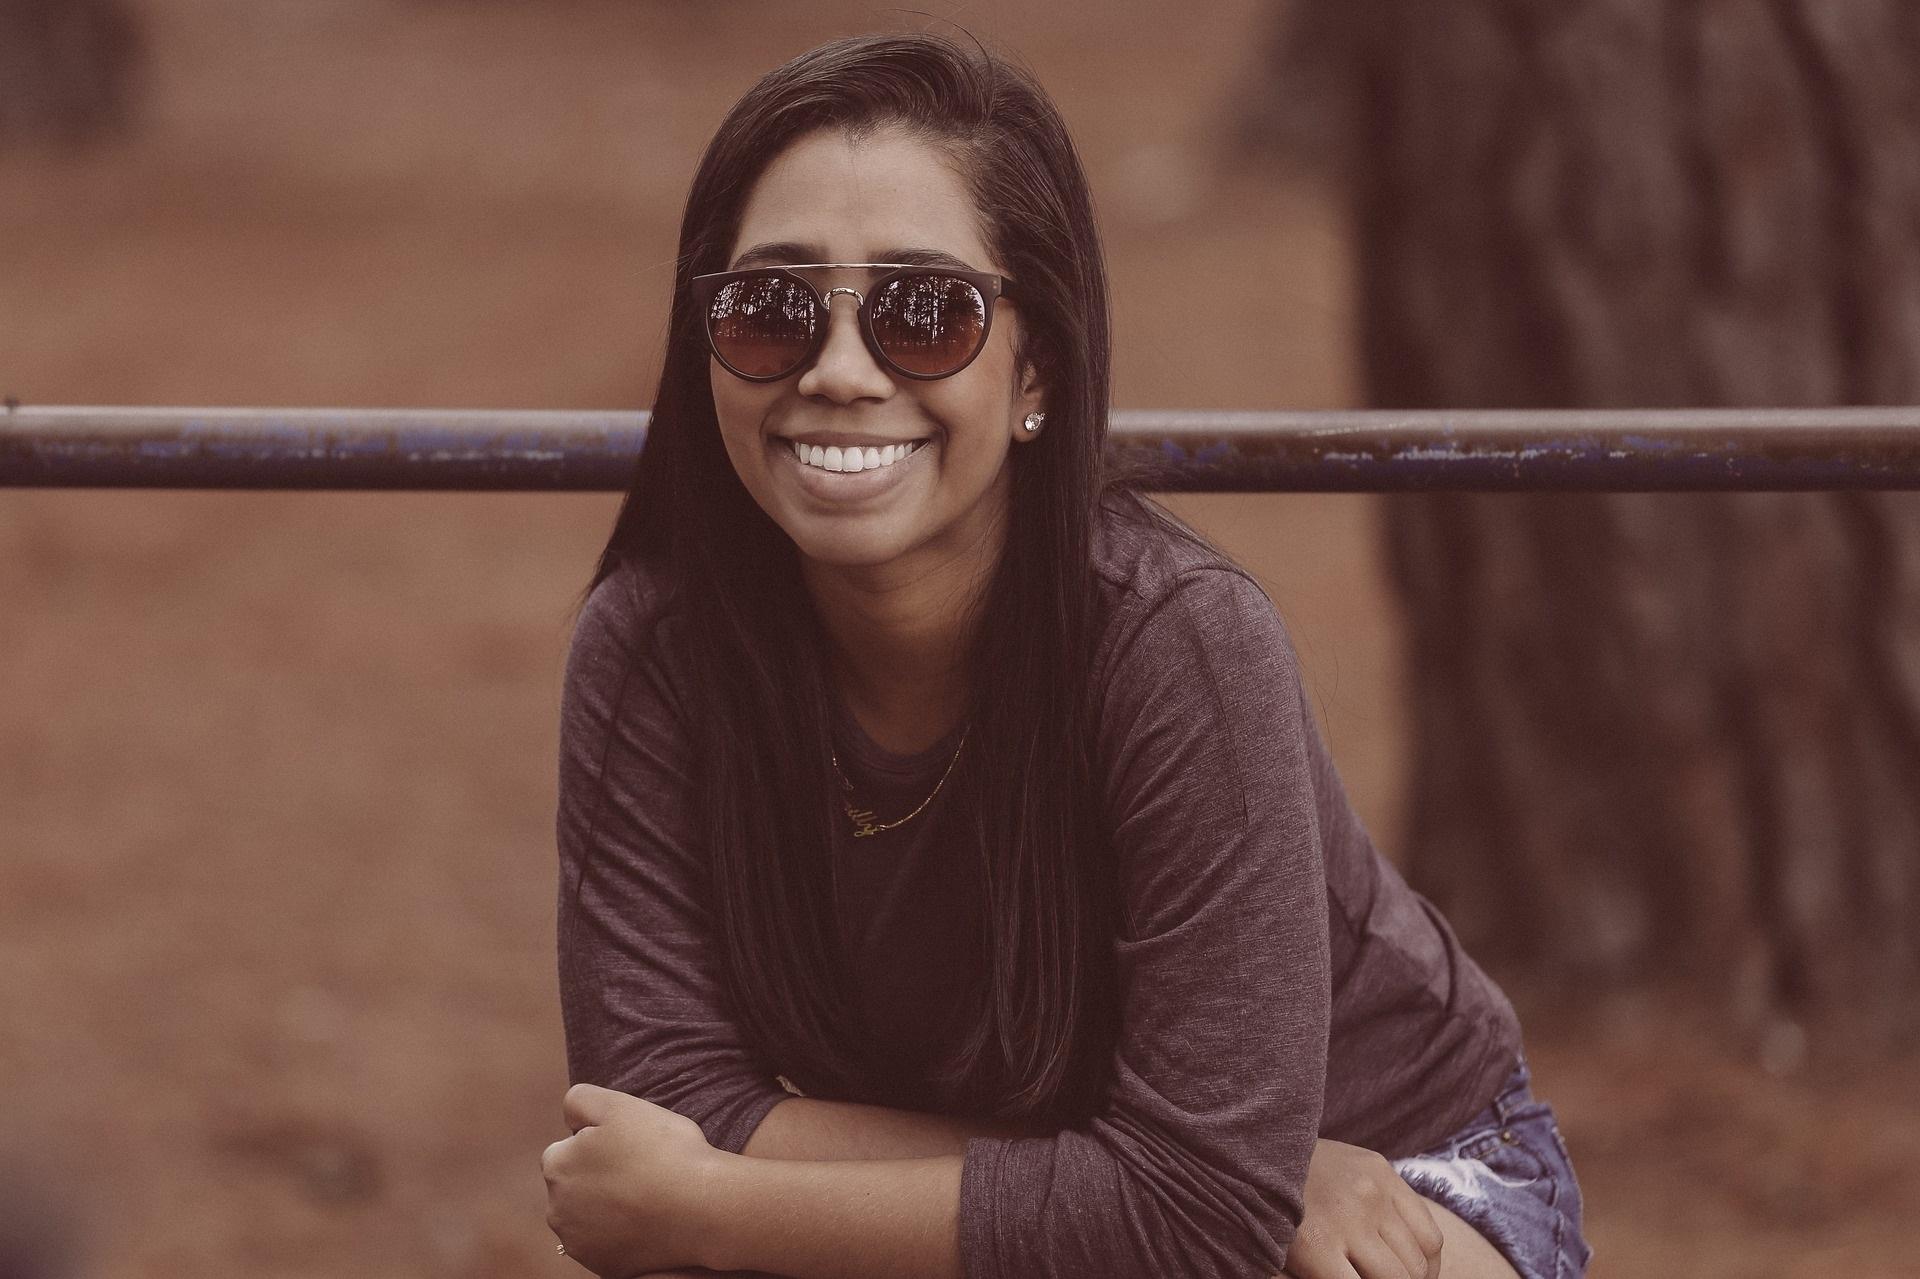 African American Black Woman in Sunglasses